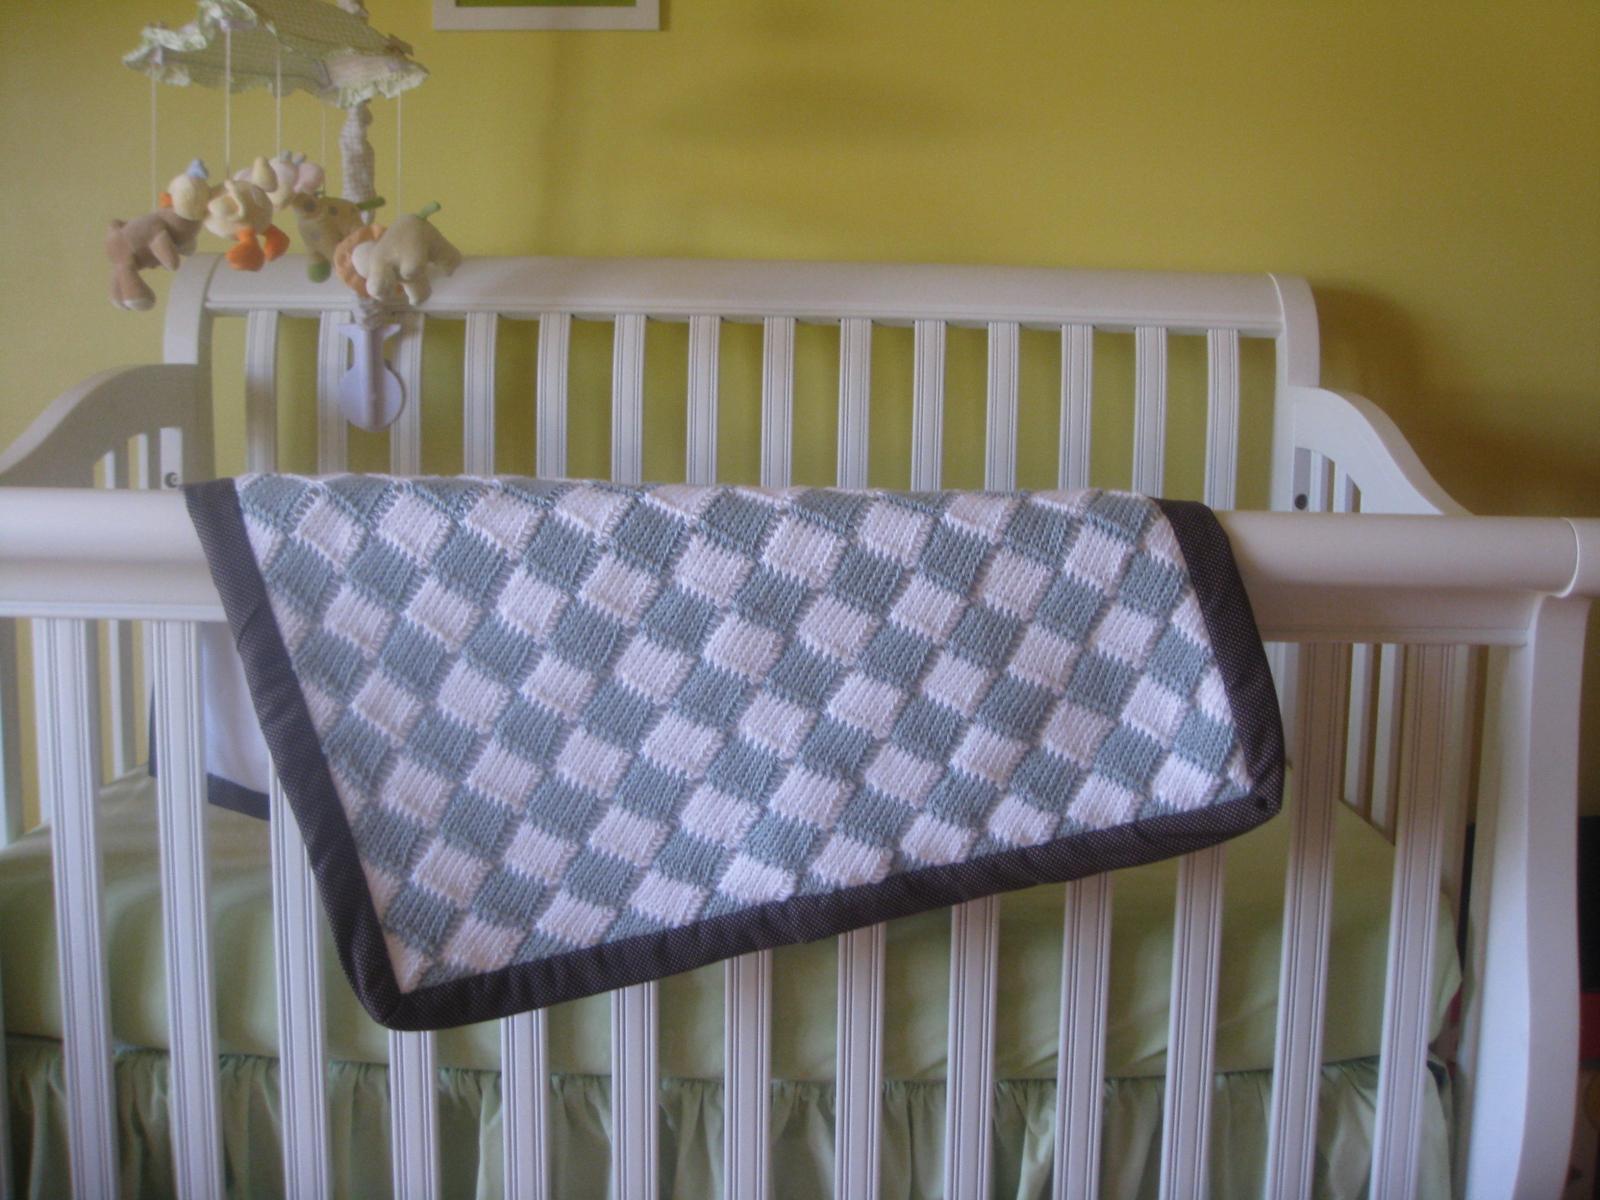 CROCHET BABY BLANKET Free Crochet Design and Pattern